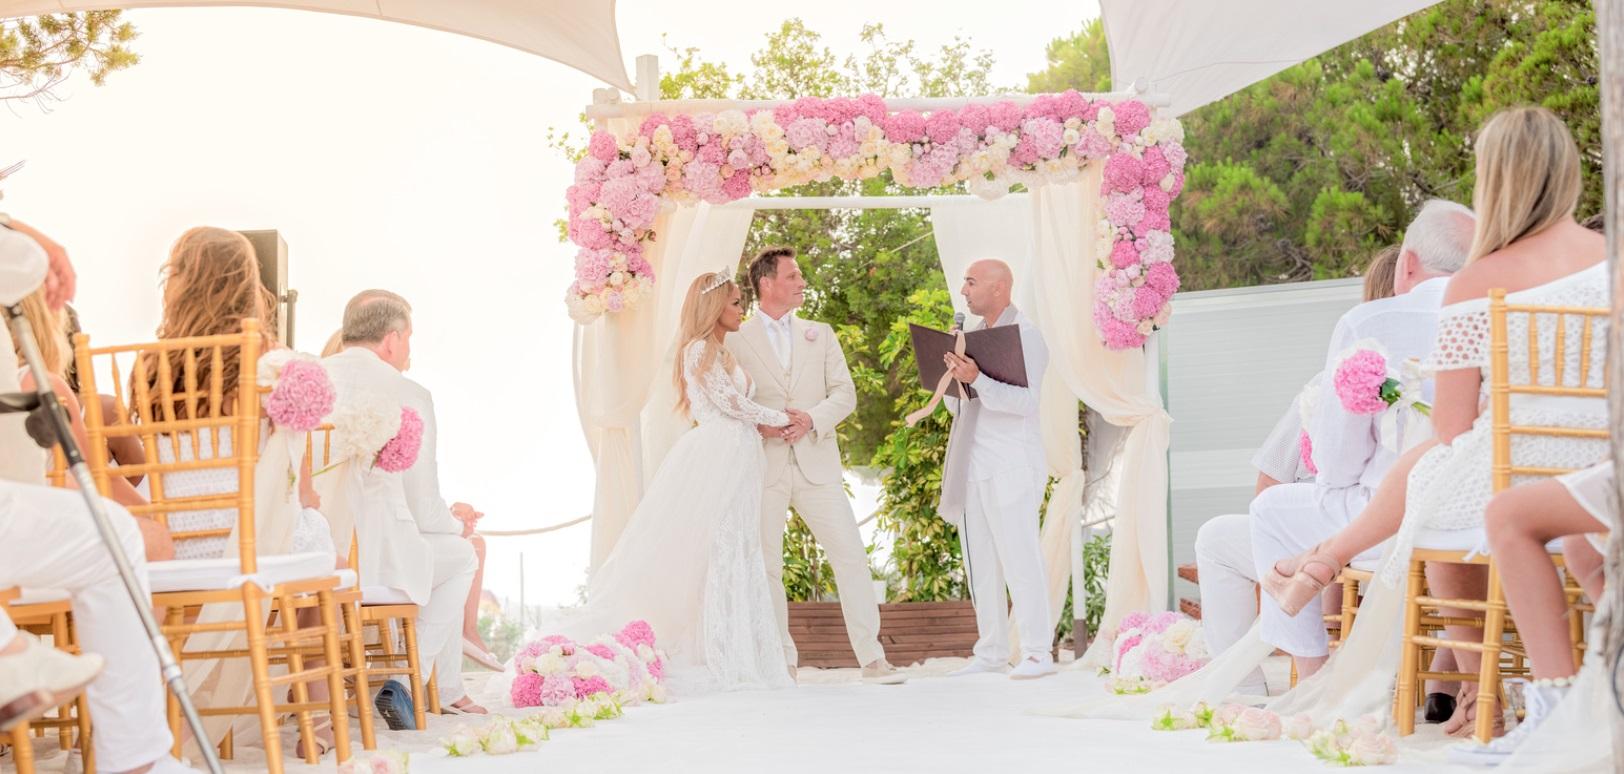 ibiza wedding flowers bouquet design